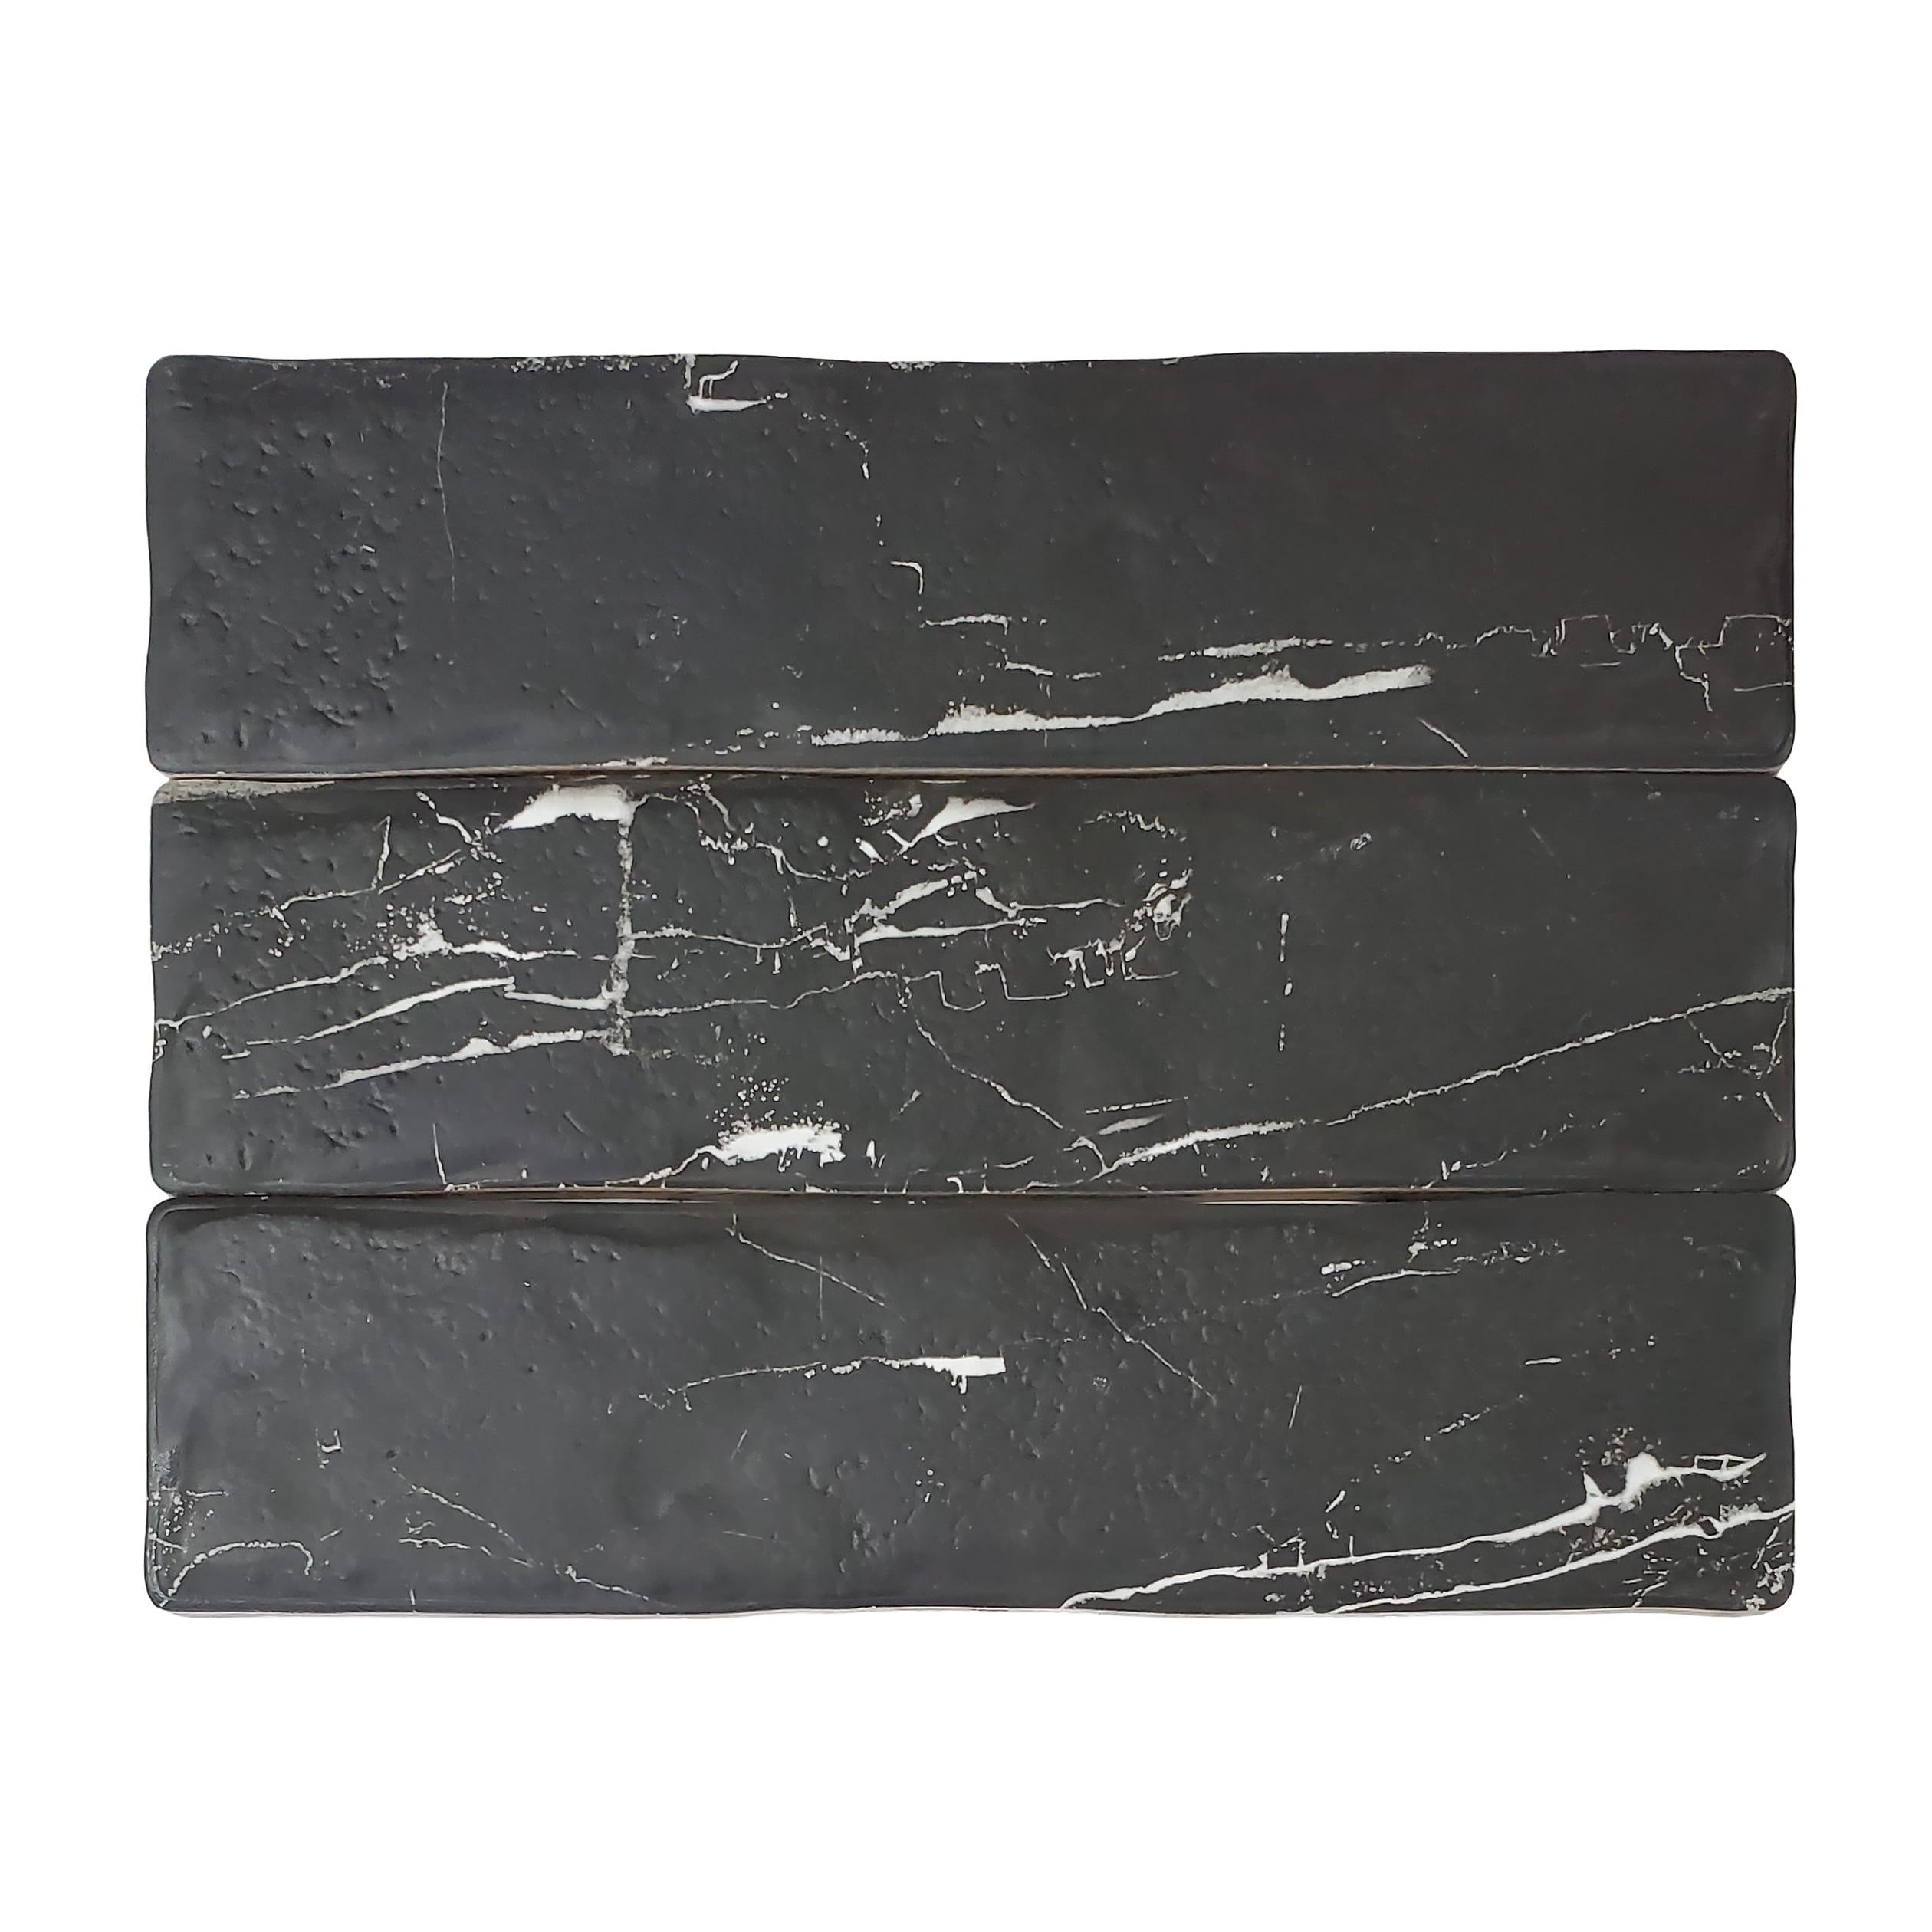 3×12 Fossil Matte Tile_Bianco_8.5sfct_3.89_2.29